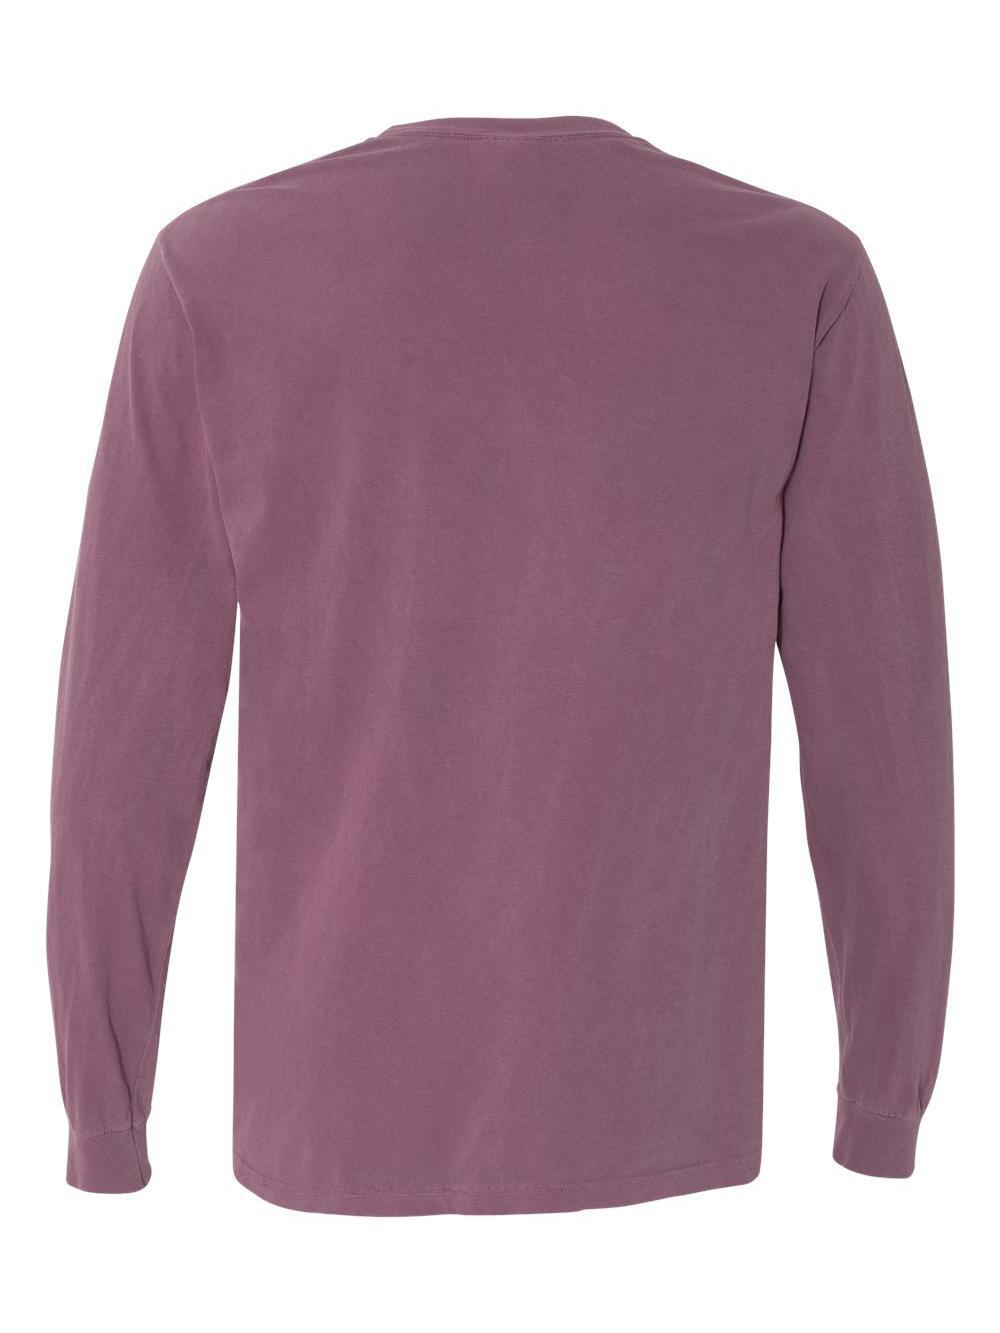 Comfort-Colors-Garment-Dyed-Heavyweight-Ringspun-Long-Sleeve-T-Shirt-6014 thumbnail 4